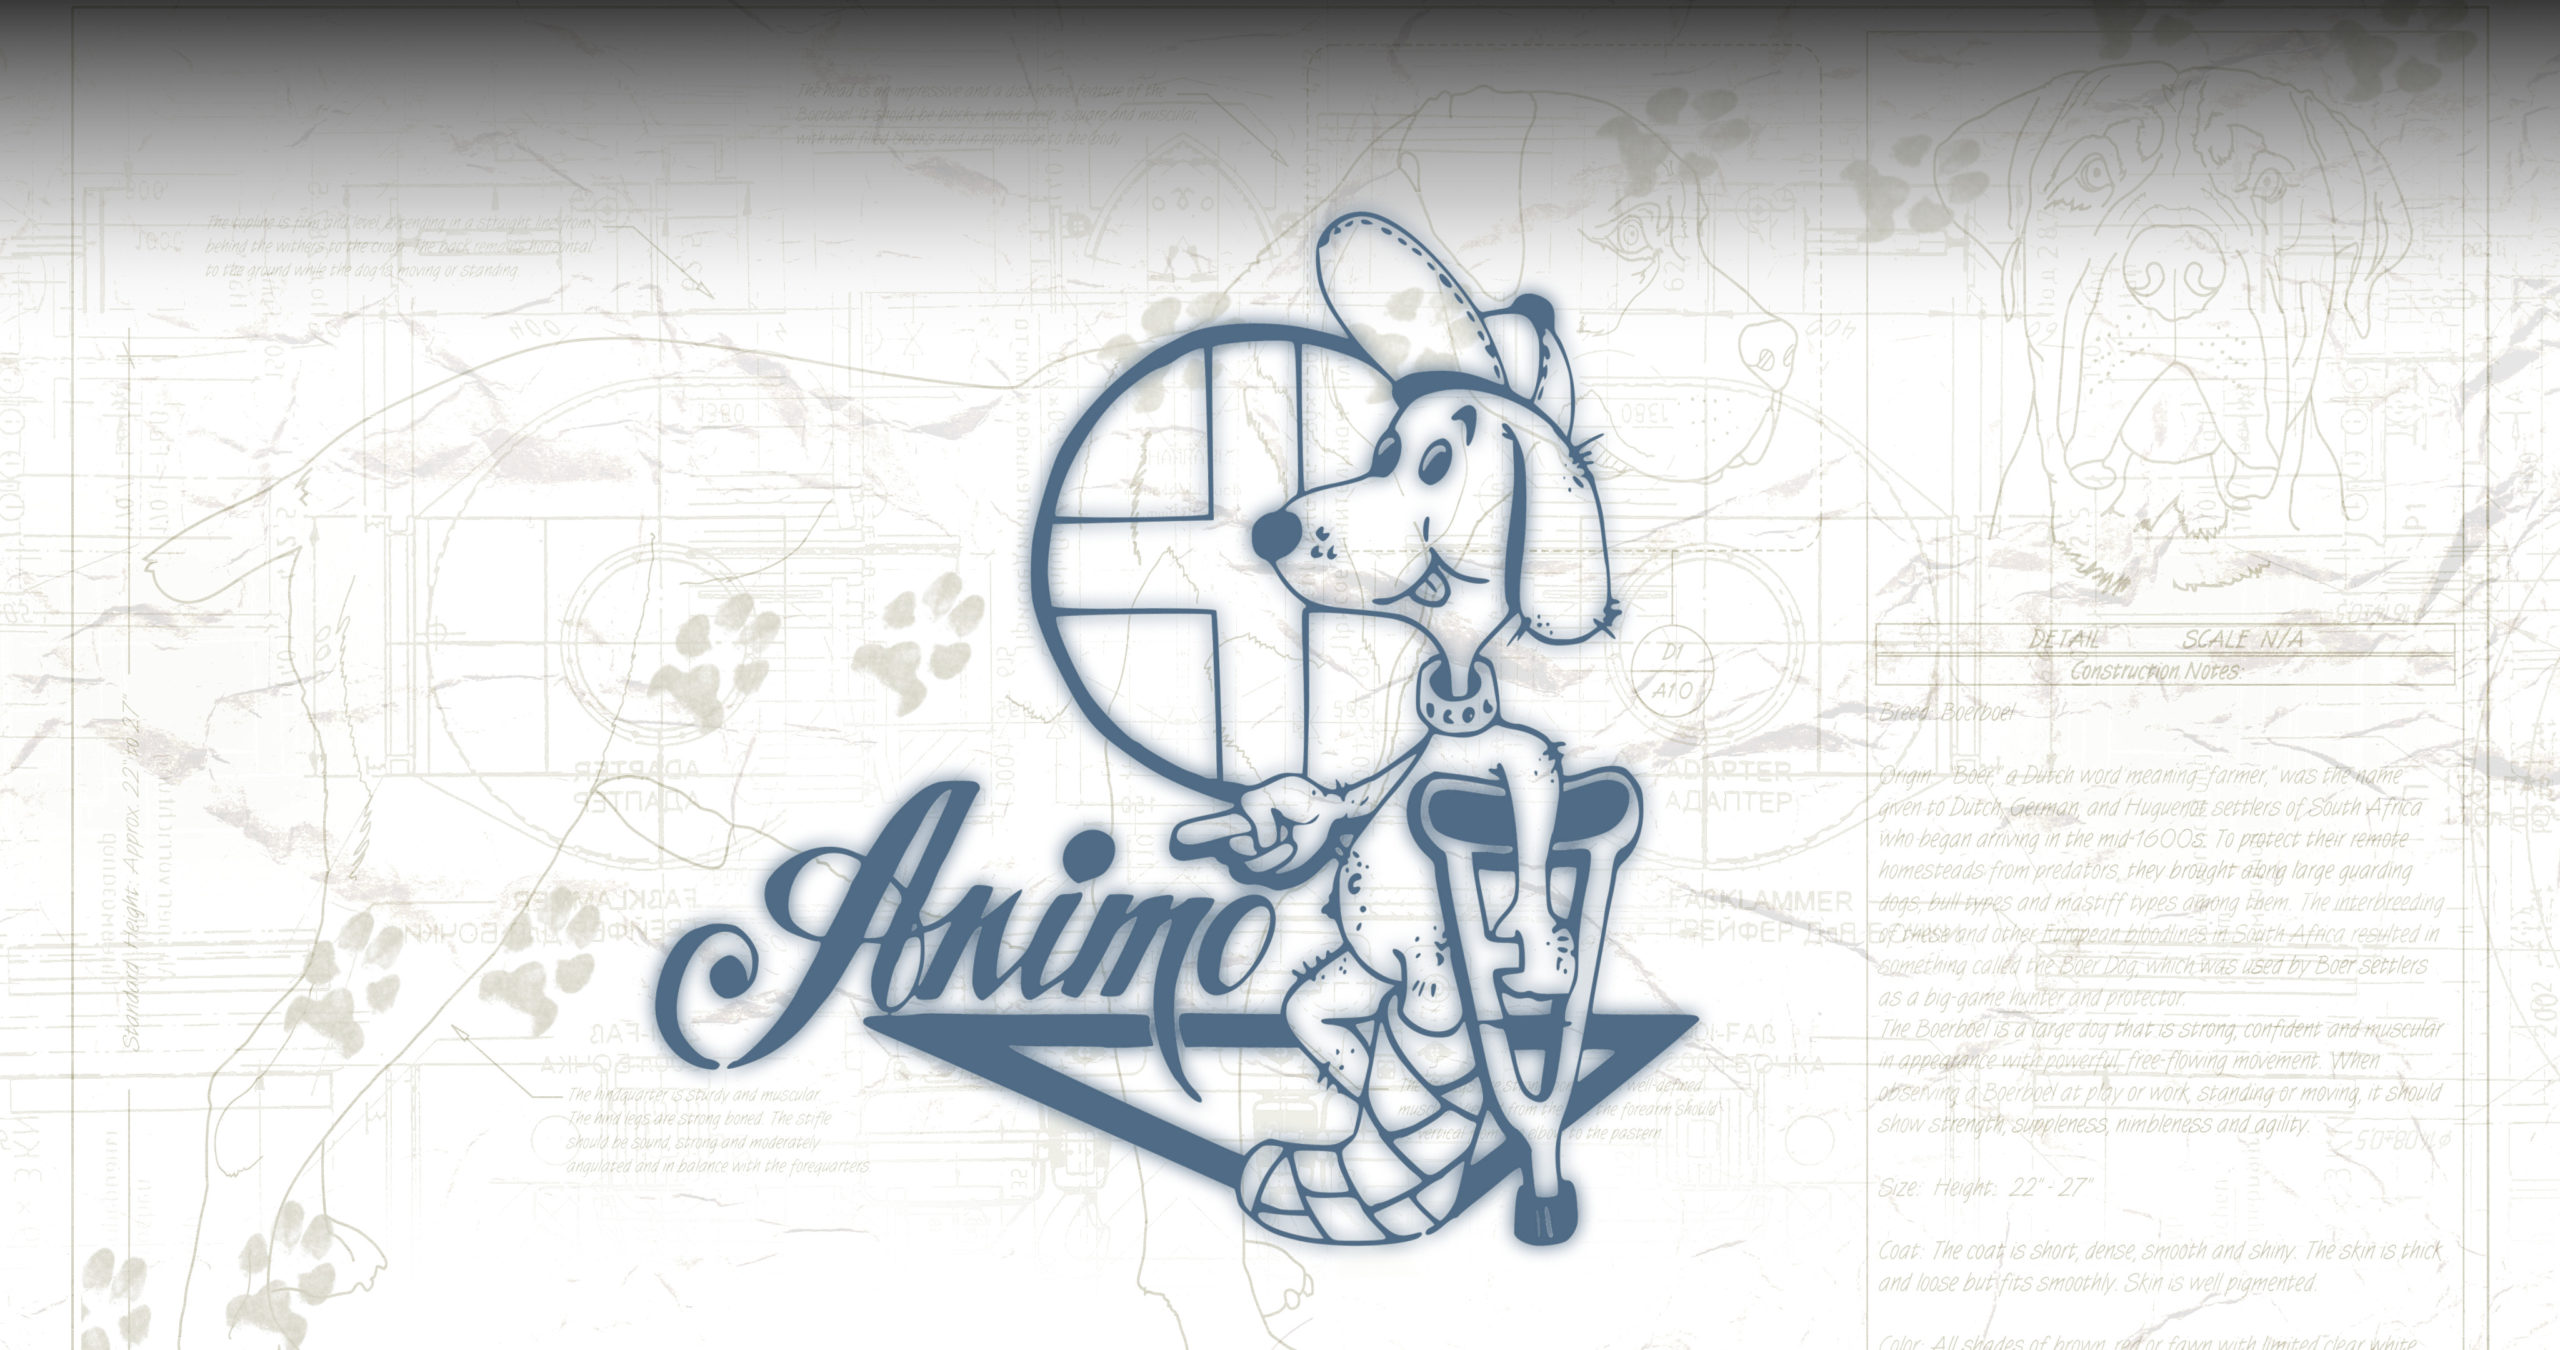 Animo background